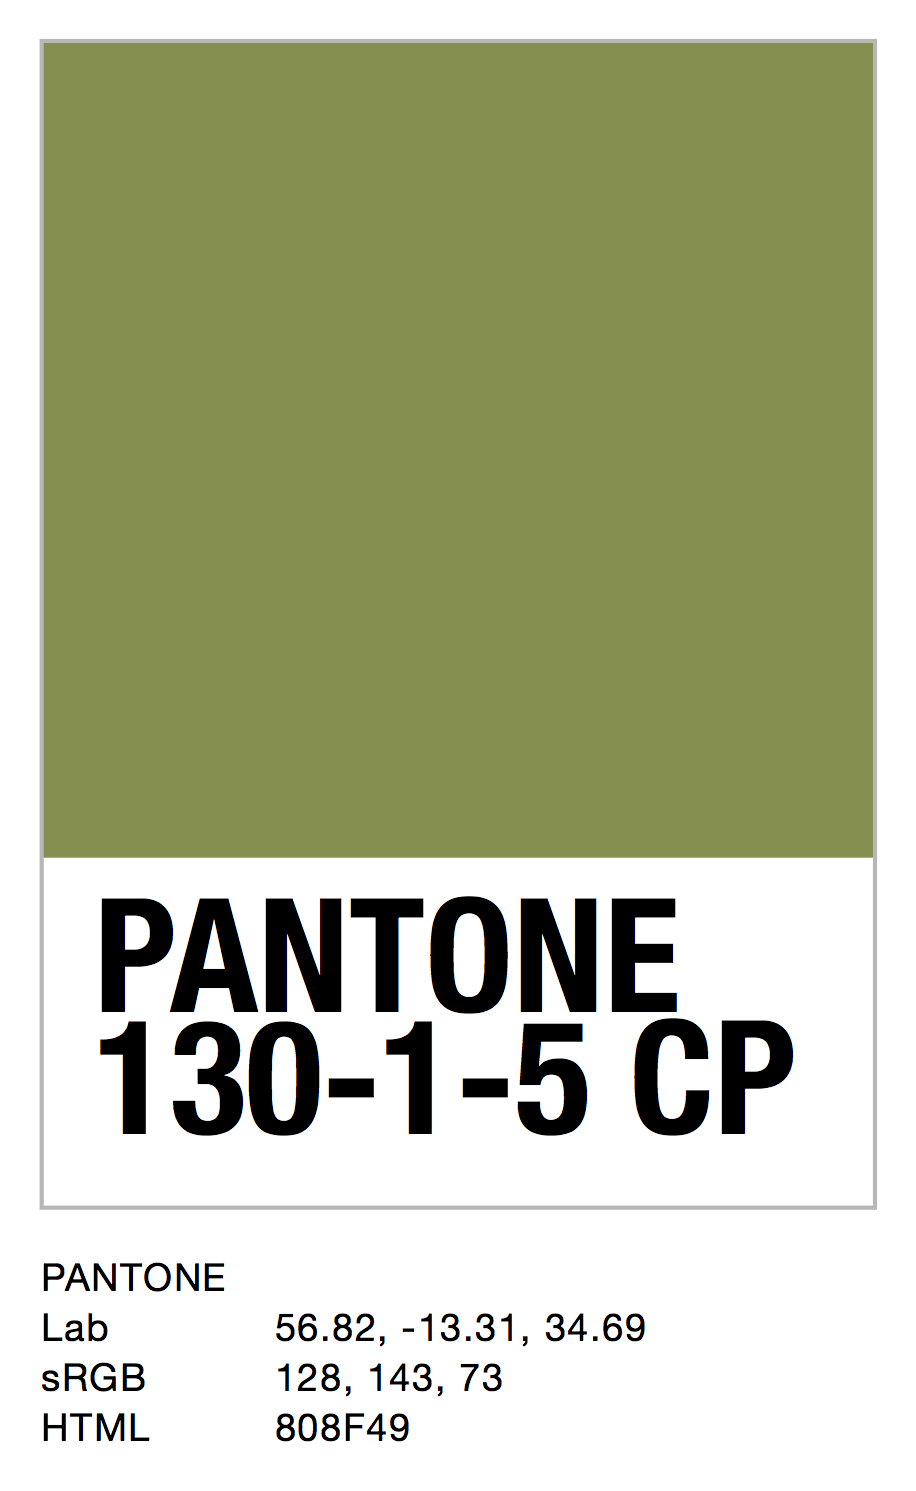 PANTONE 130-1-5 CP.jpg